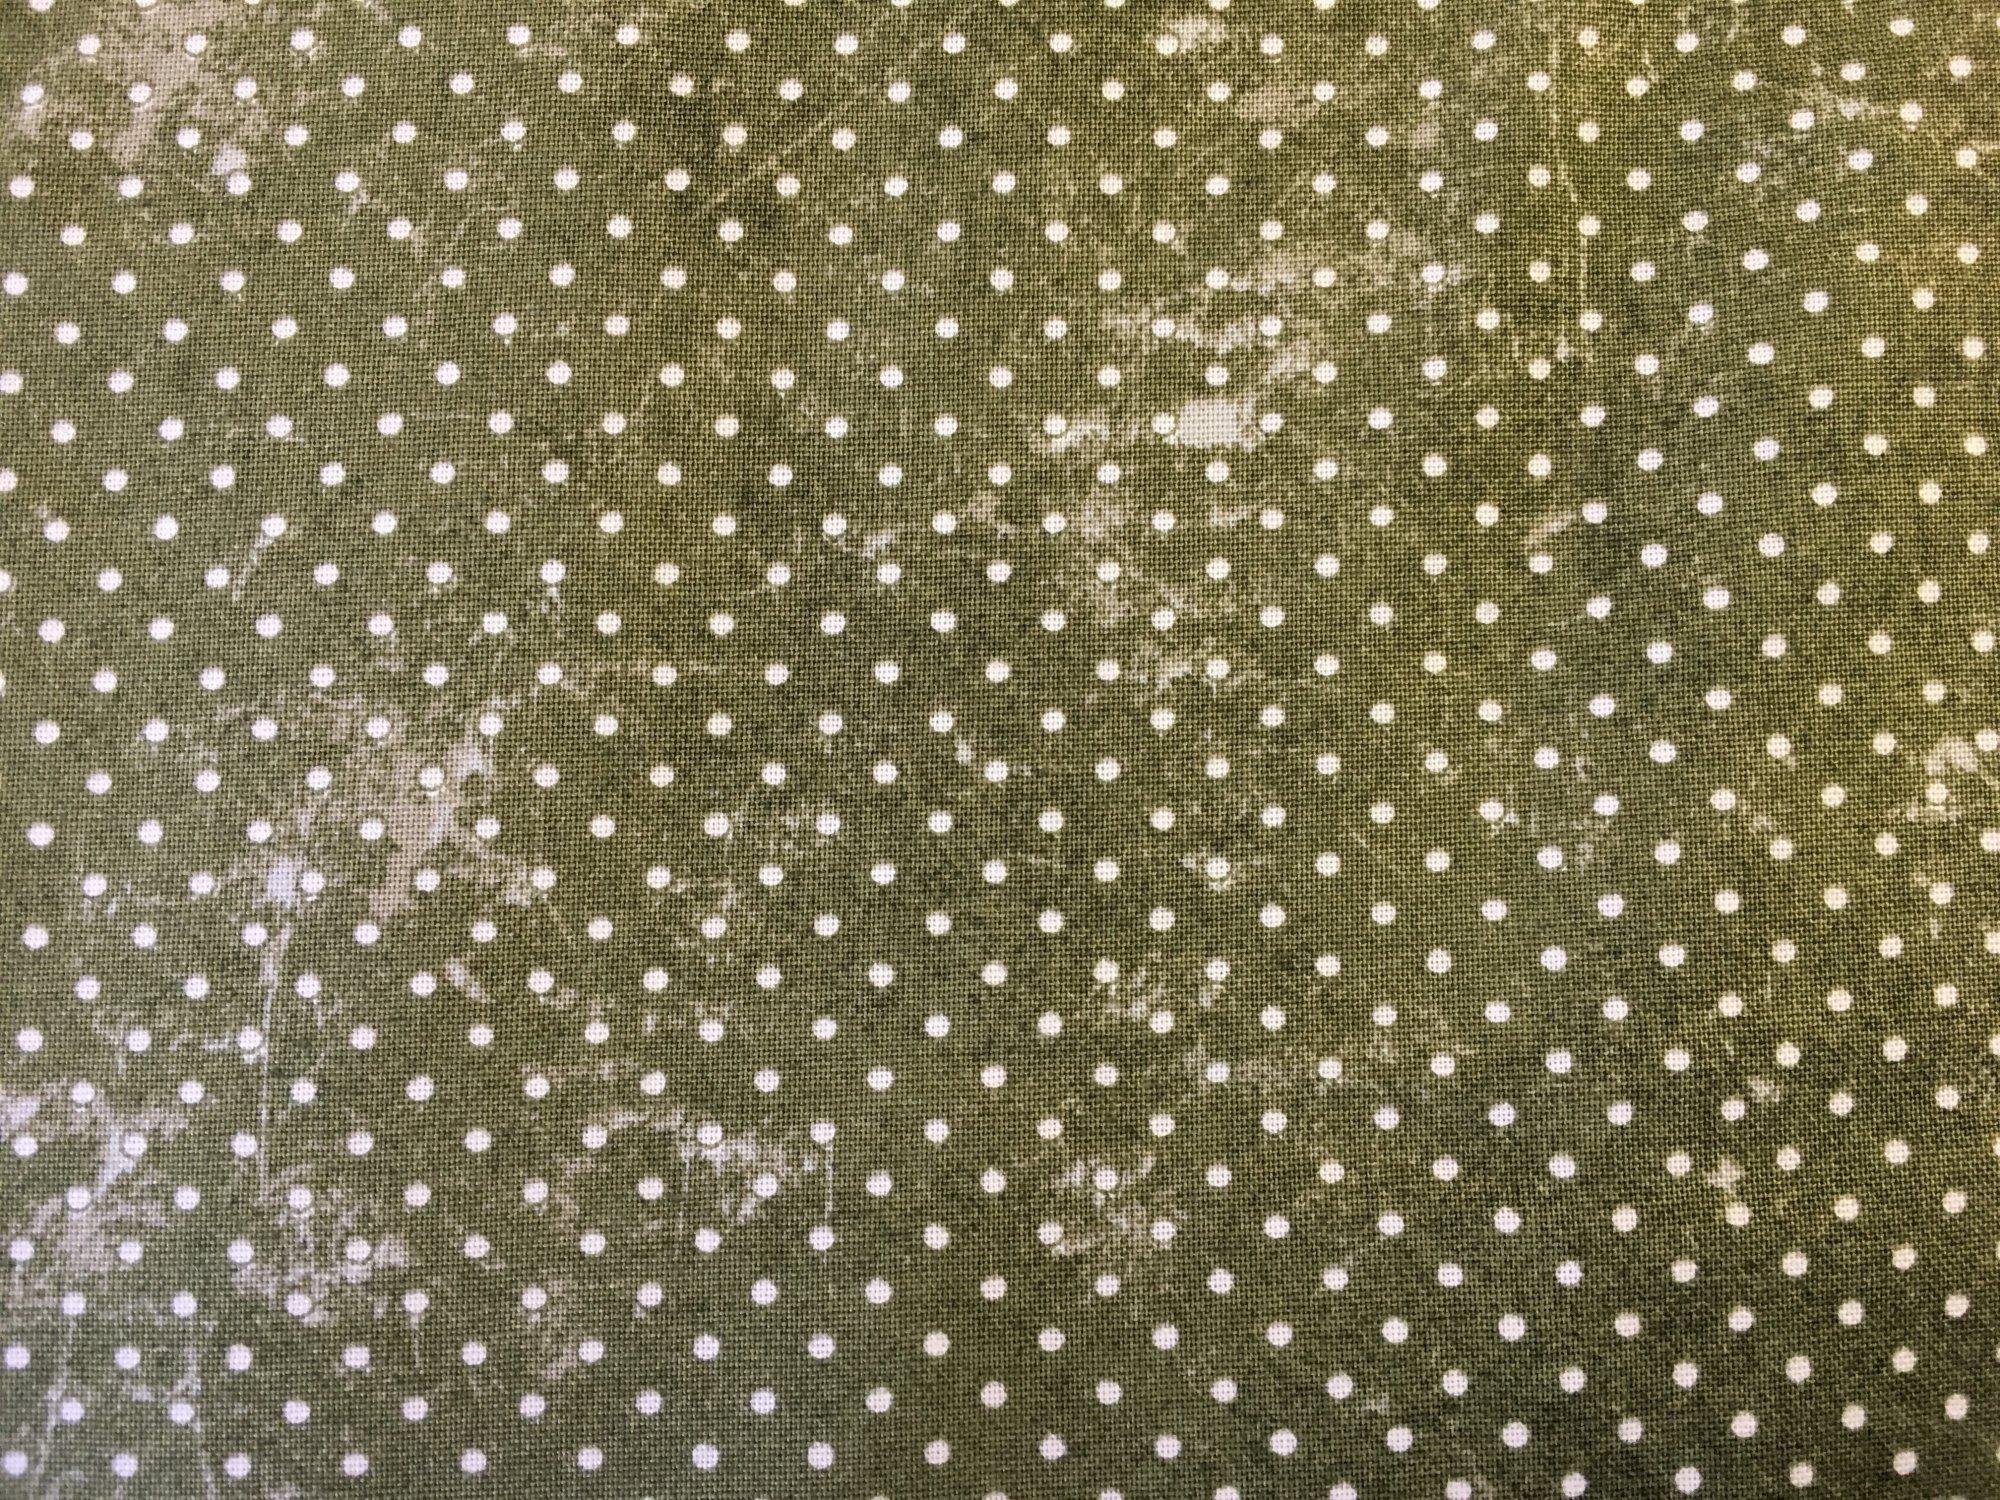 Merriment Dots Green PWTH0878GREE Tim Holtz